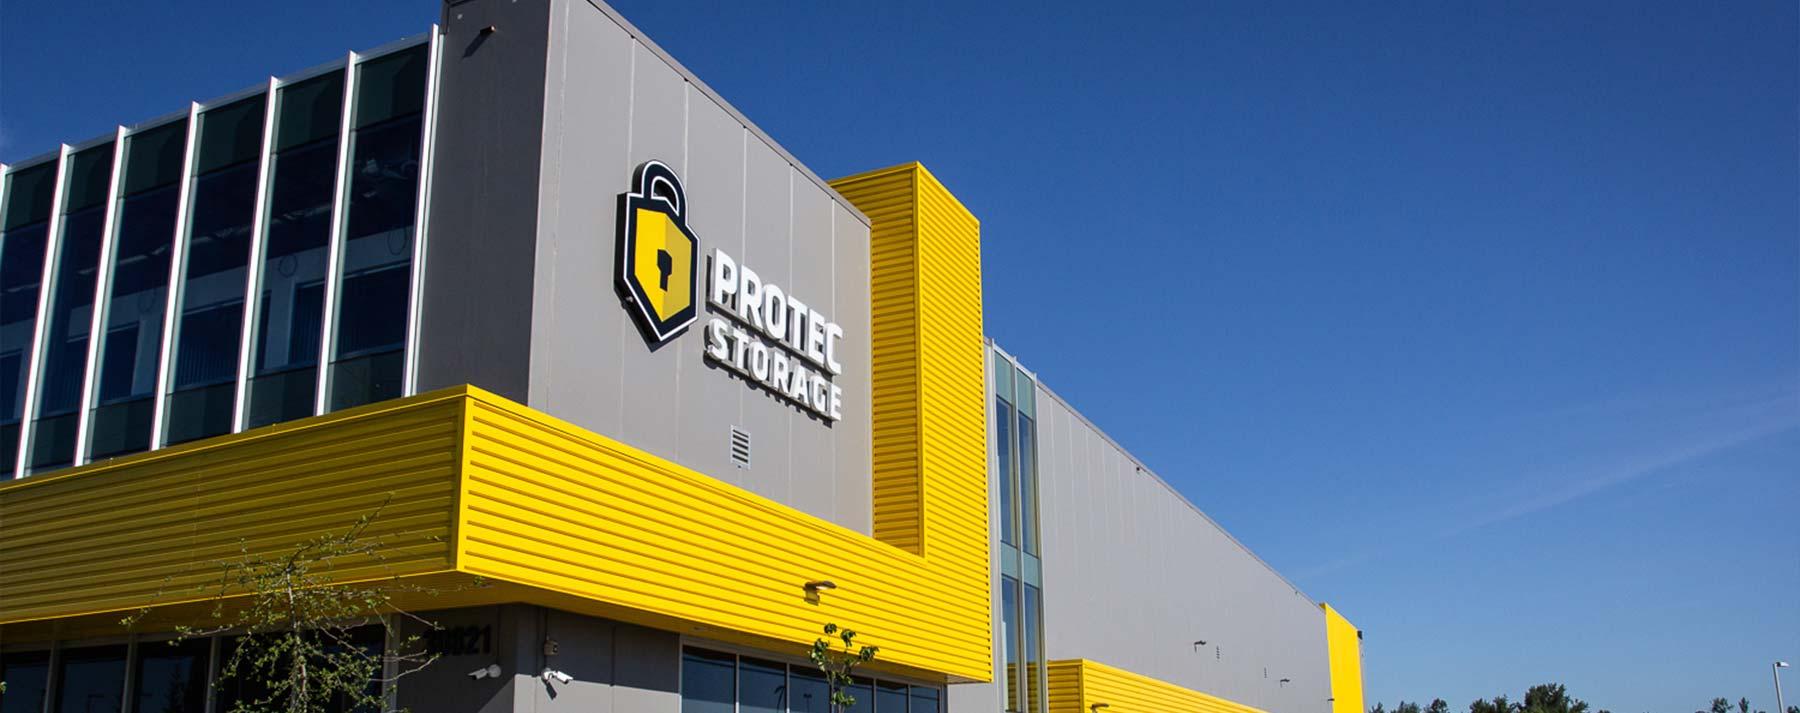 Abbotsford Self Storage Facility | 24/7 Secure Storage